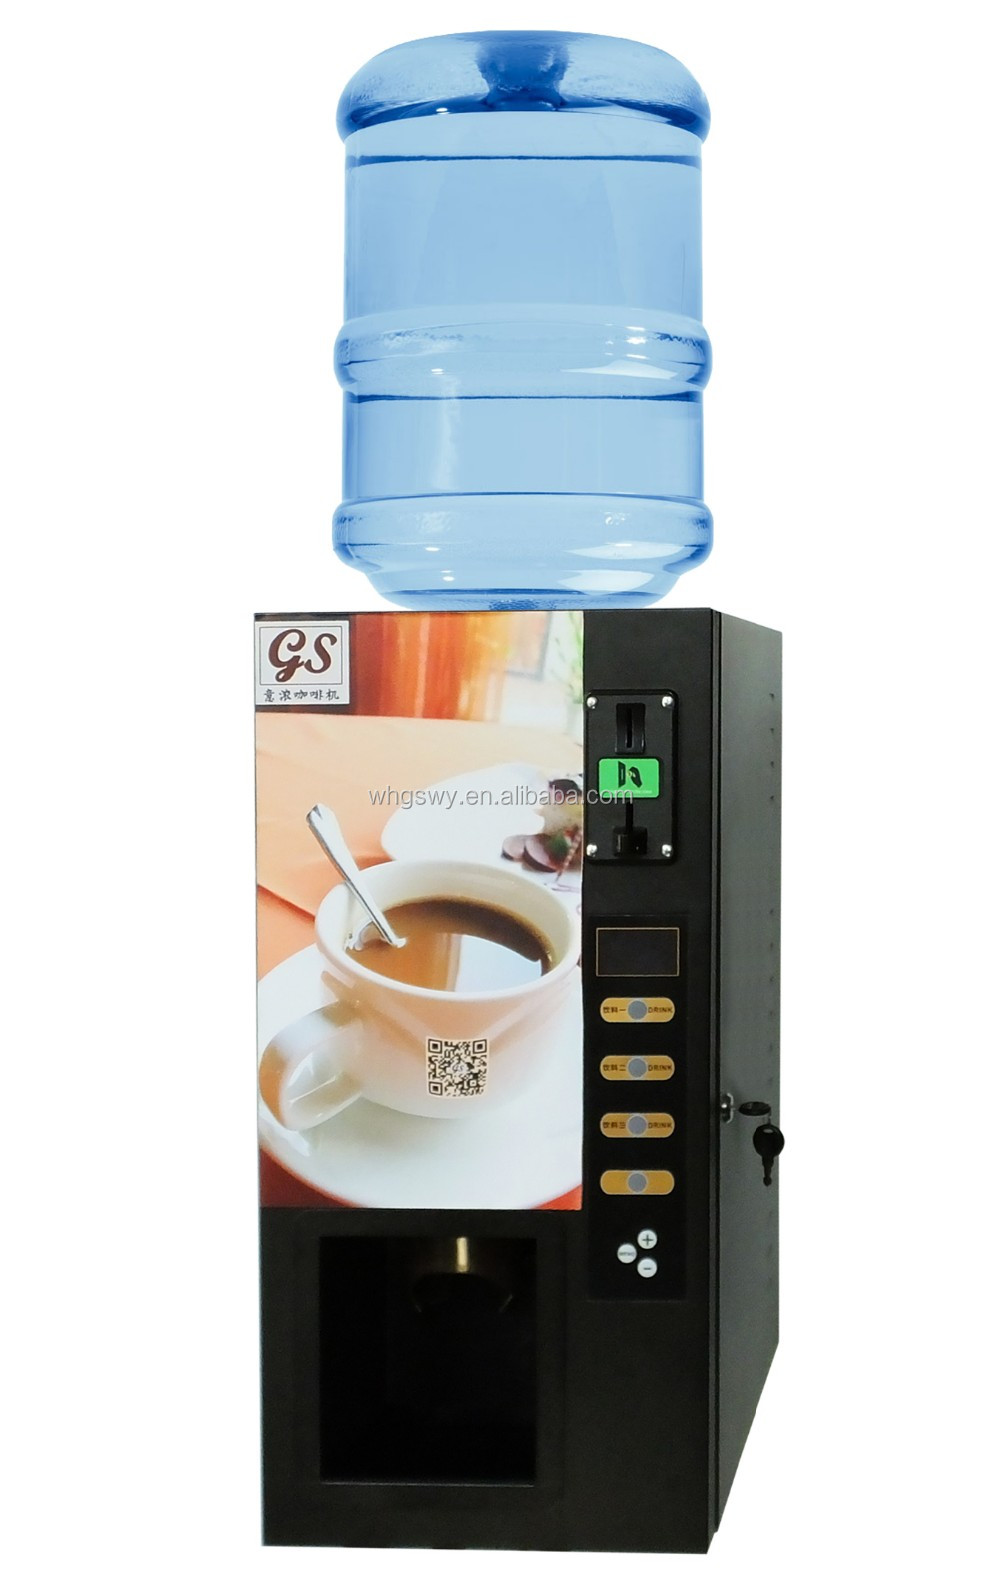 kaffee tee suppe nescafe instant pulver automaten kaffeemaschine produkt id 60210059260 german. Black Bedroom Furniture Sets. Home Design Ideas